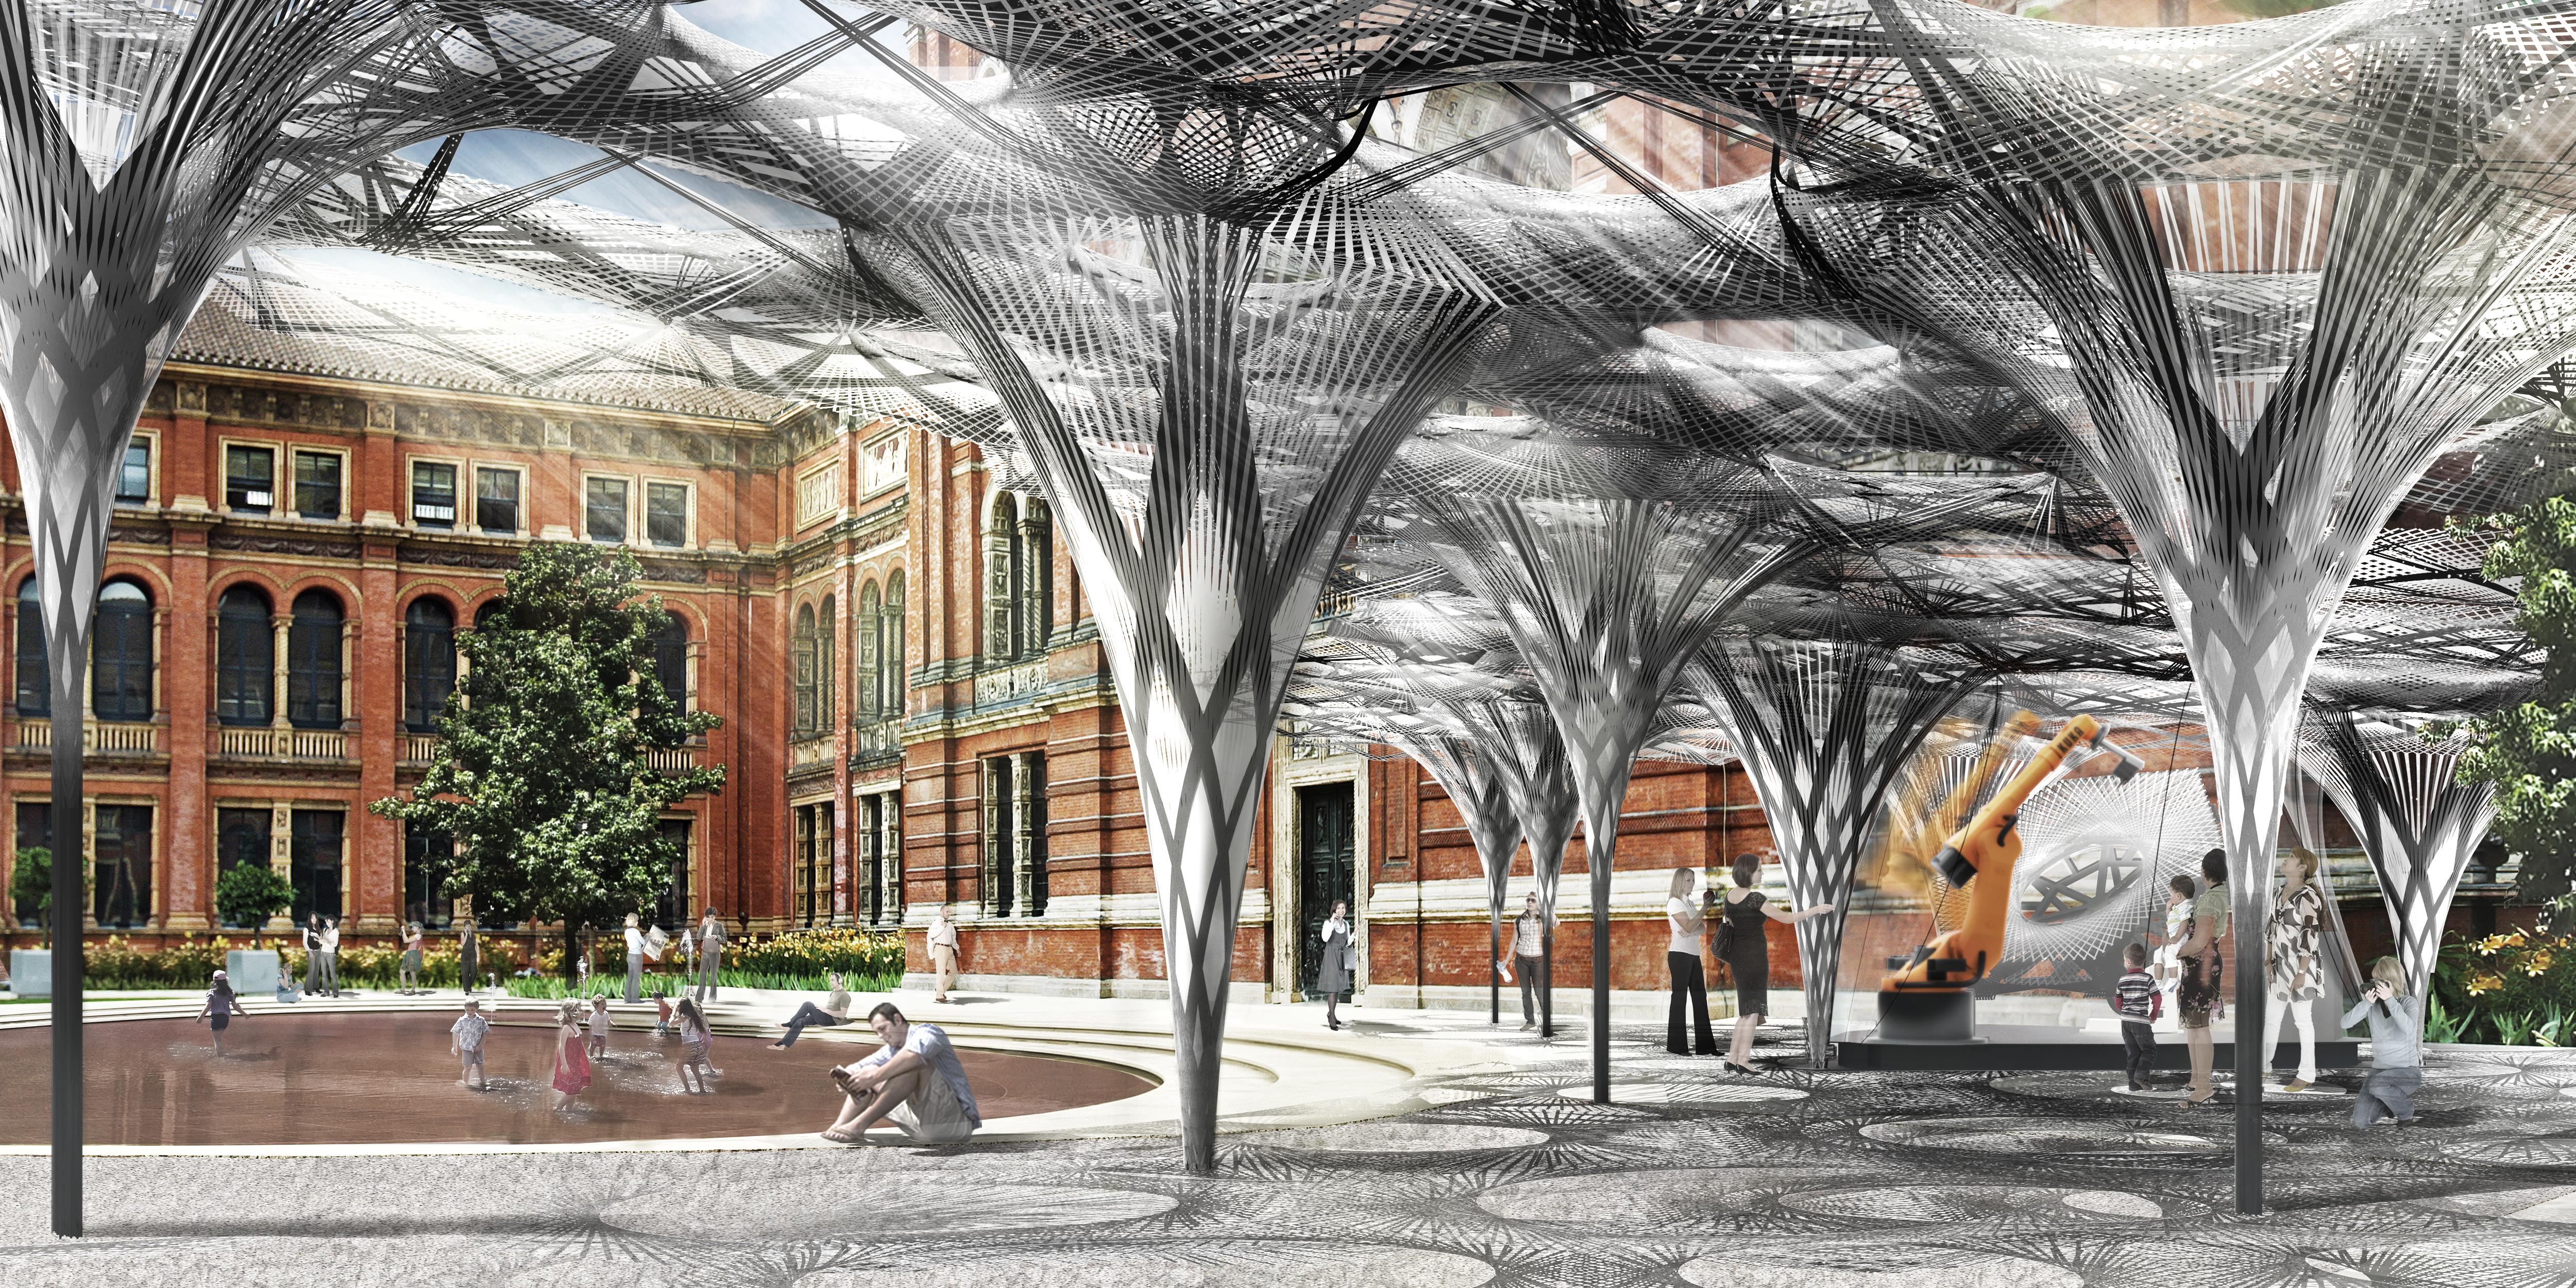 Elytra Filament Pavilion, render, V&A John Madejski Garden 2016 © ICDITKE University of Stuttgart